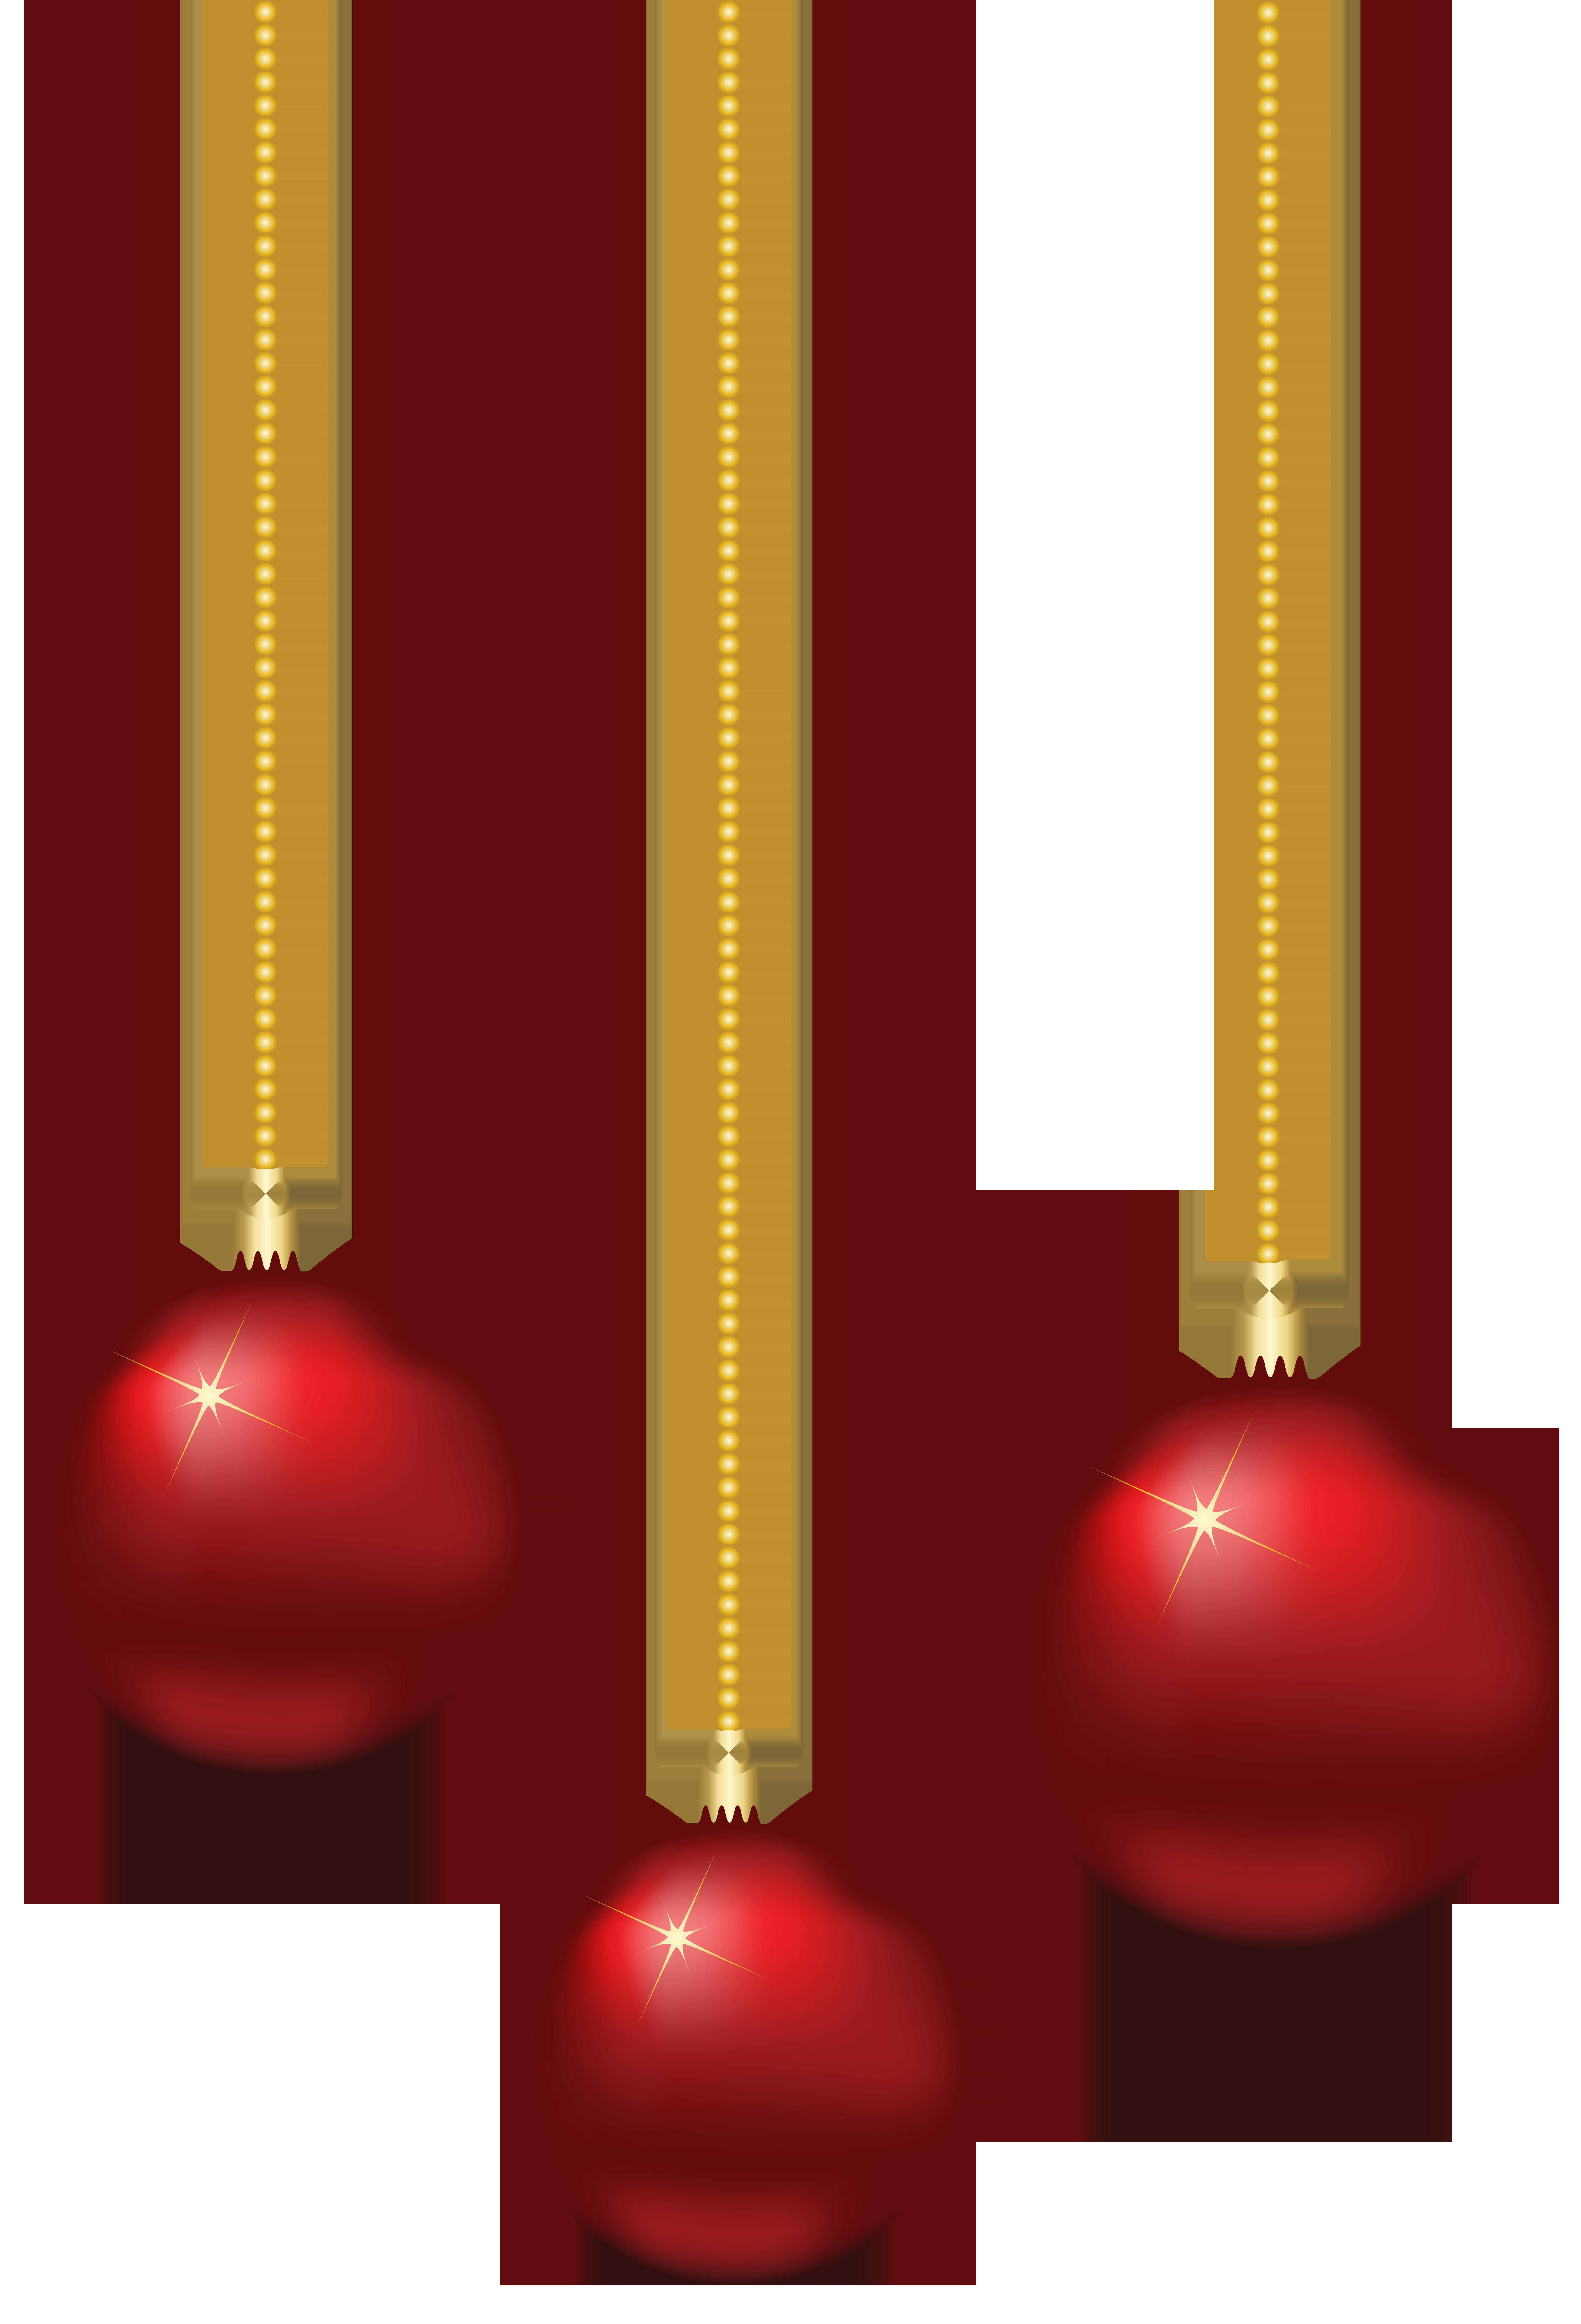 Hanging Elegant RedChristmas Balls PNG Clip Art Image.